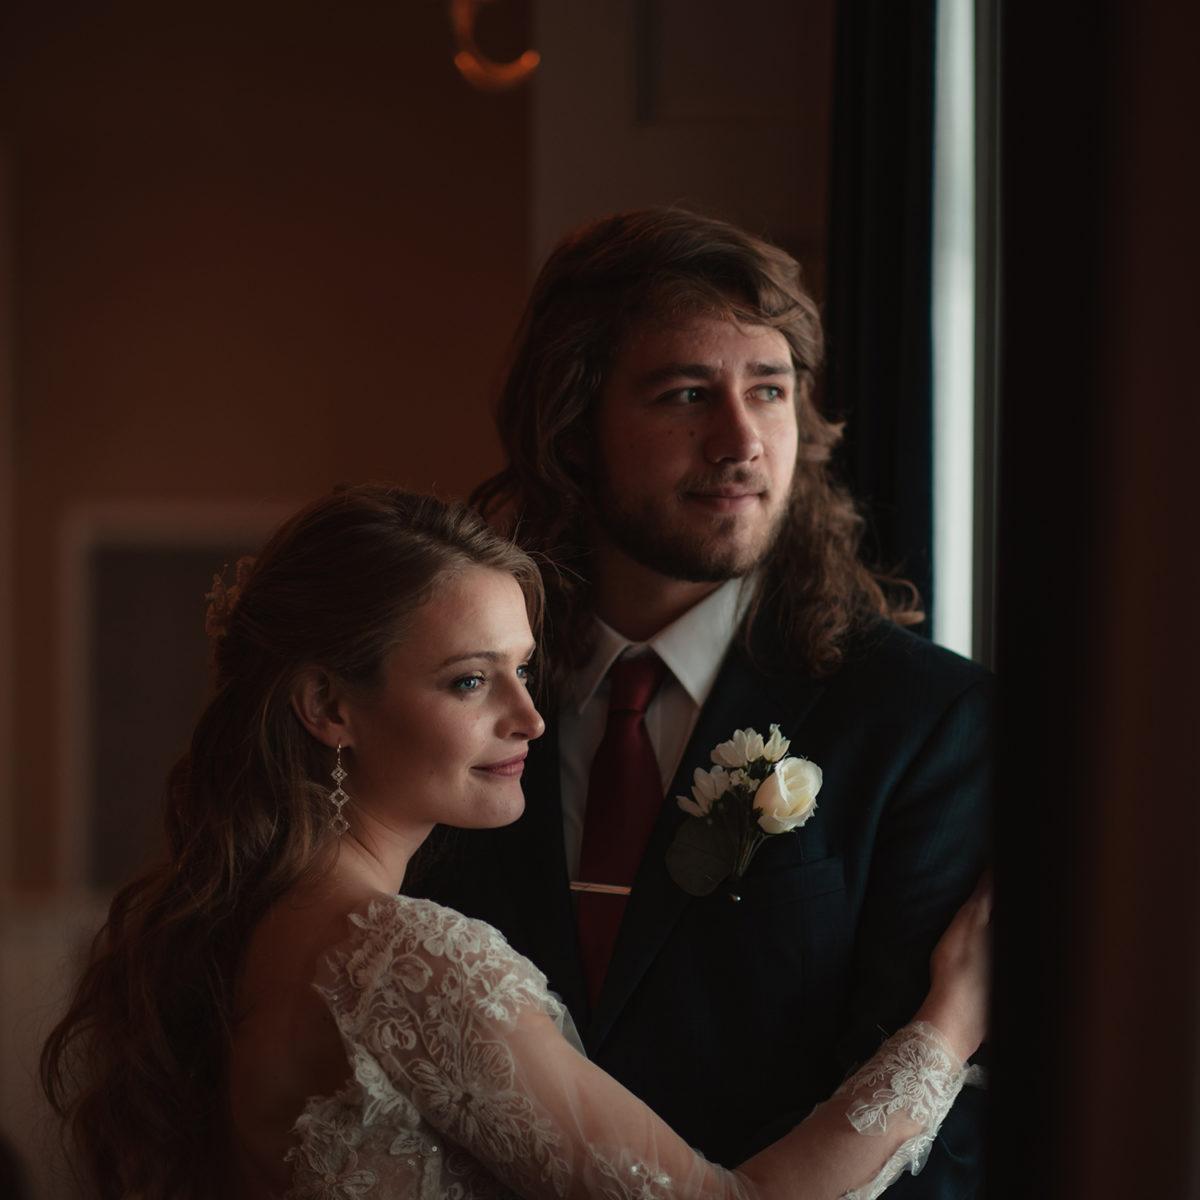 Oshkosh Winter Wedding